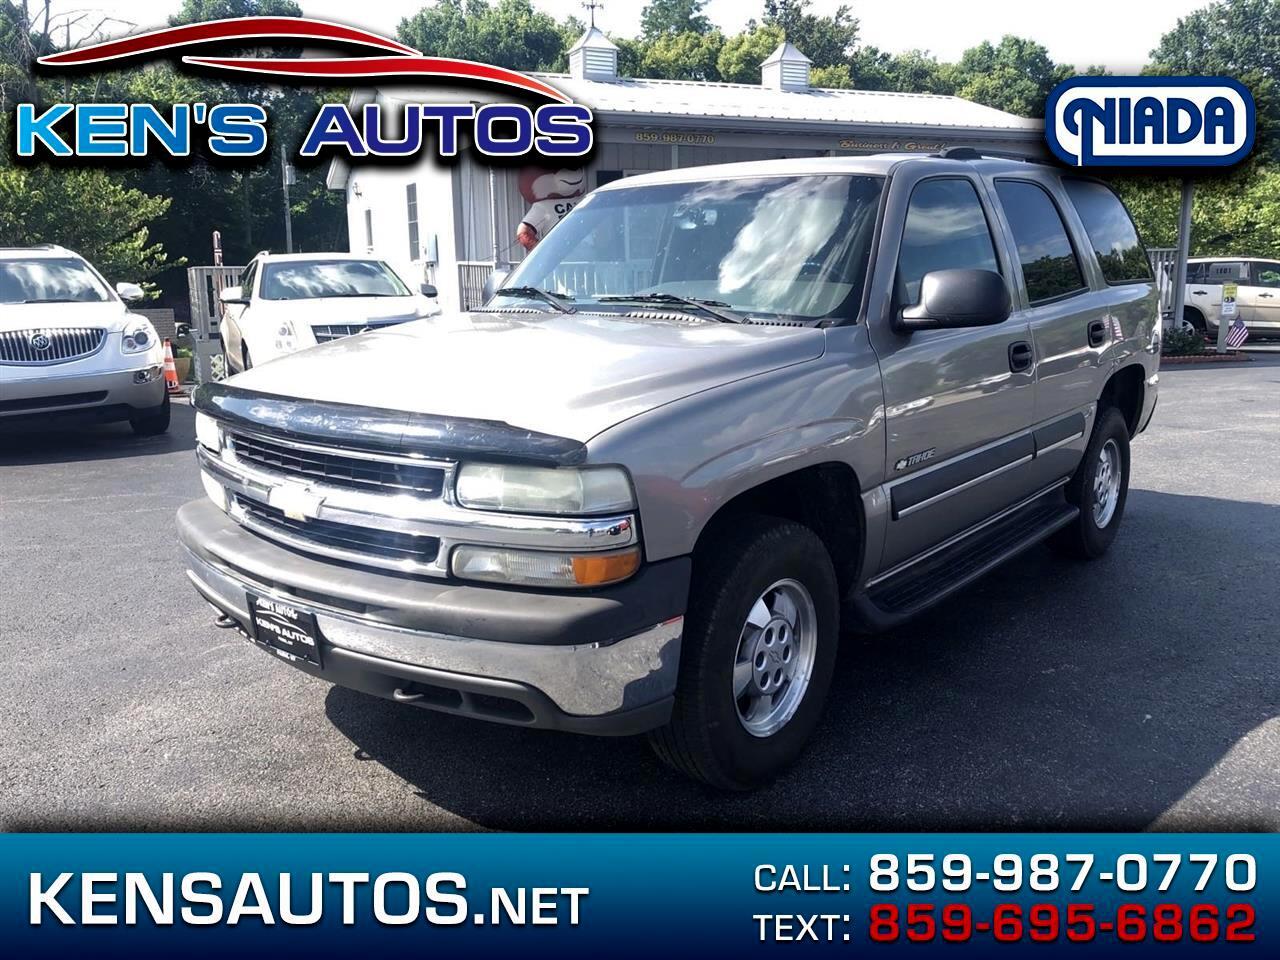 2003 Chevrolet Trucks Tahoe 4WD